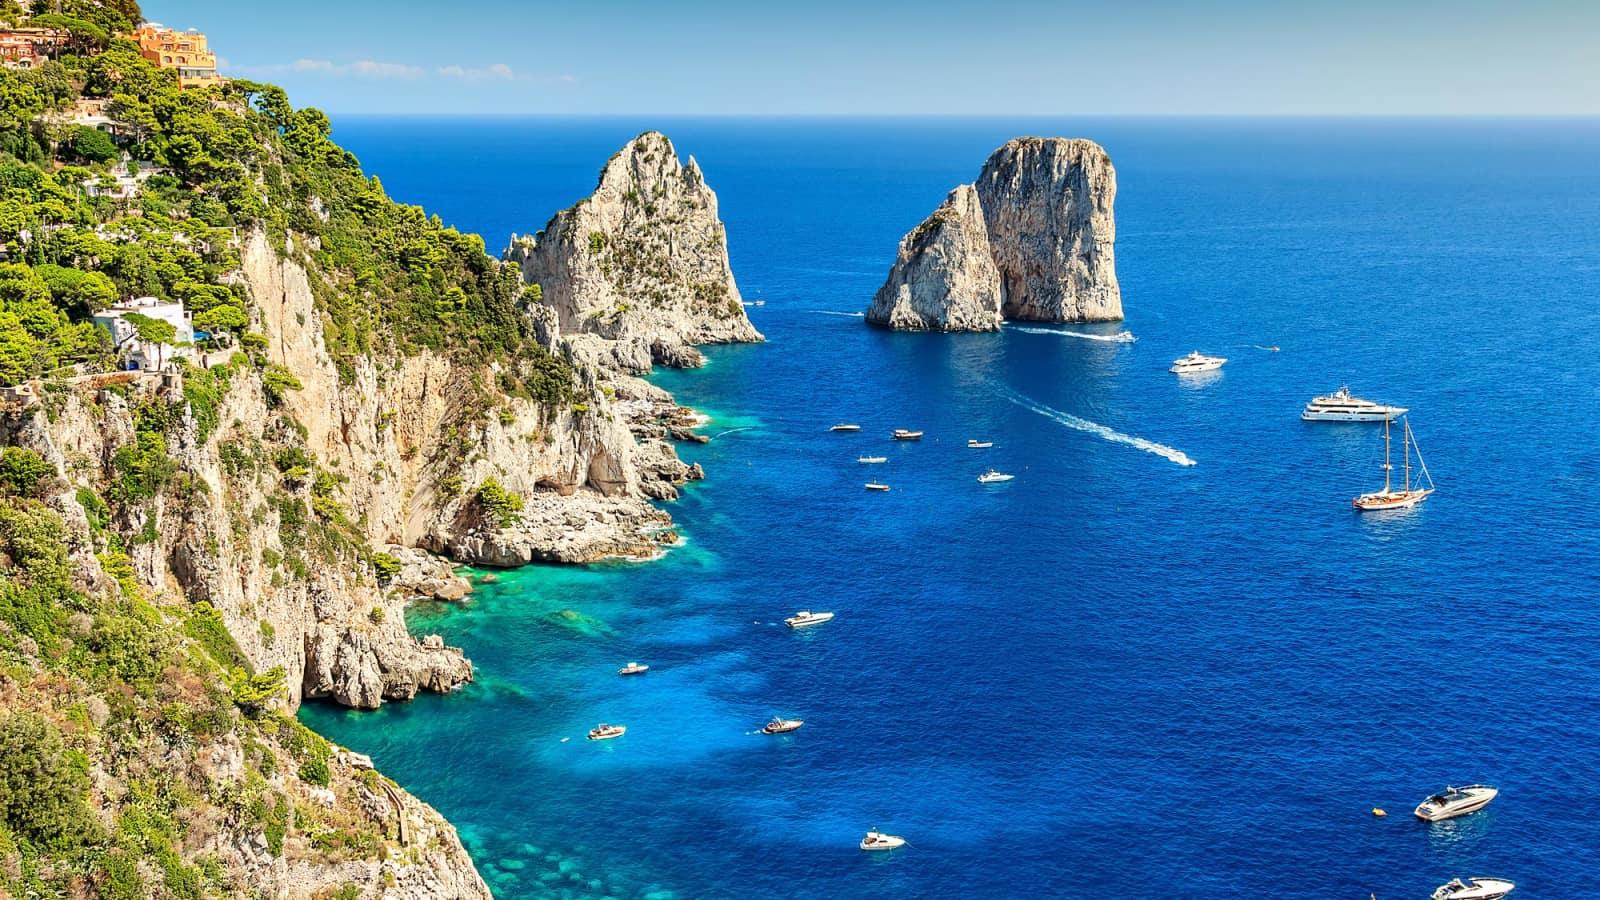 Hotel Capri Sorrento Italy